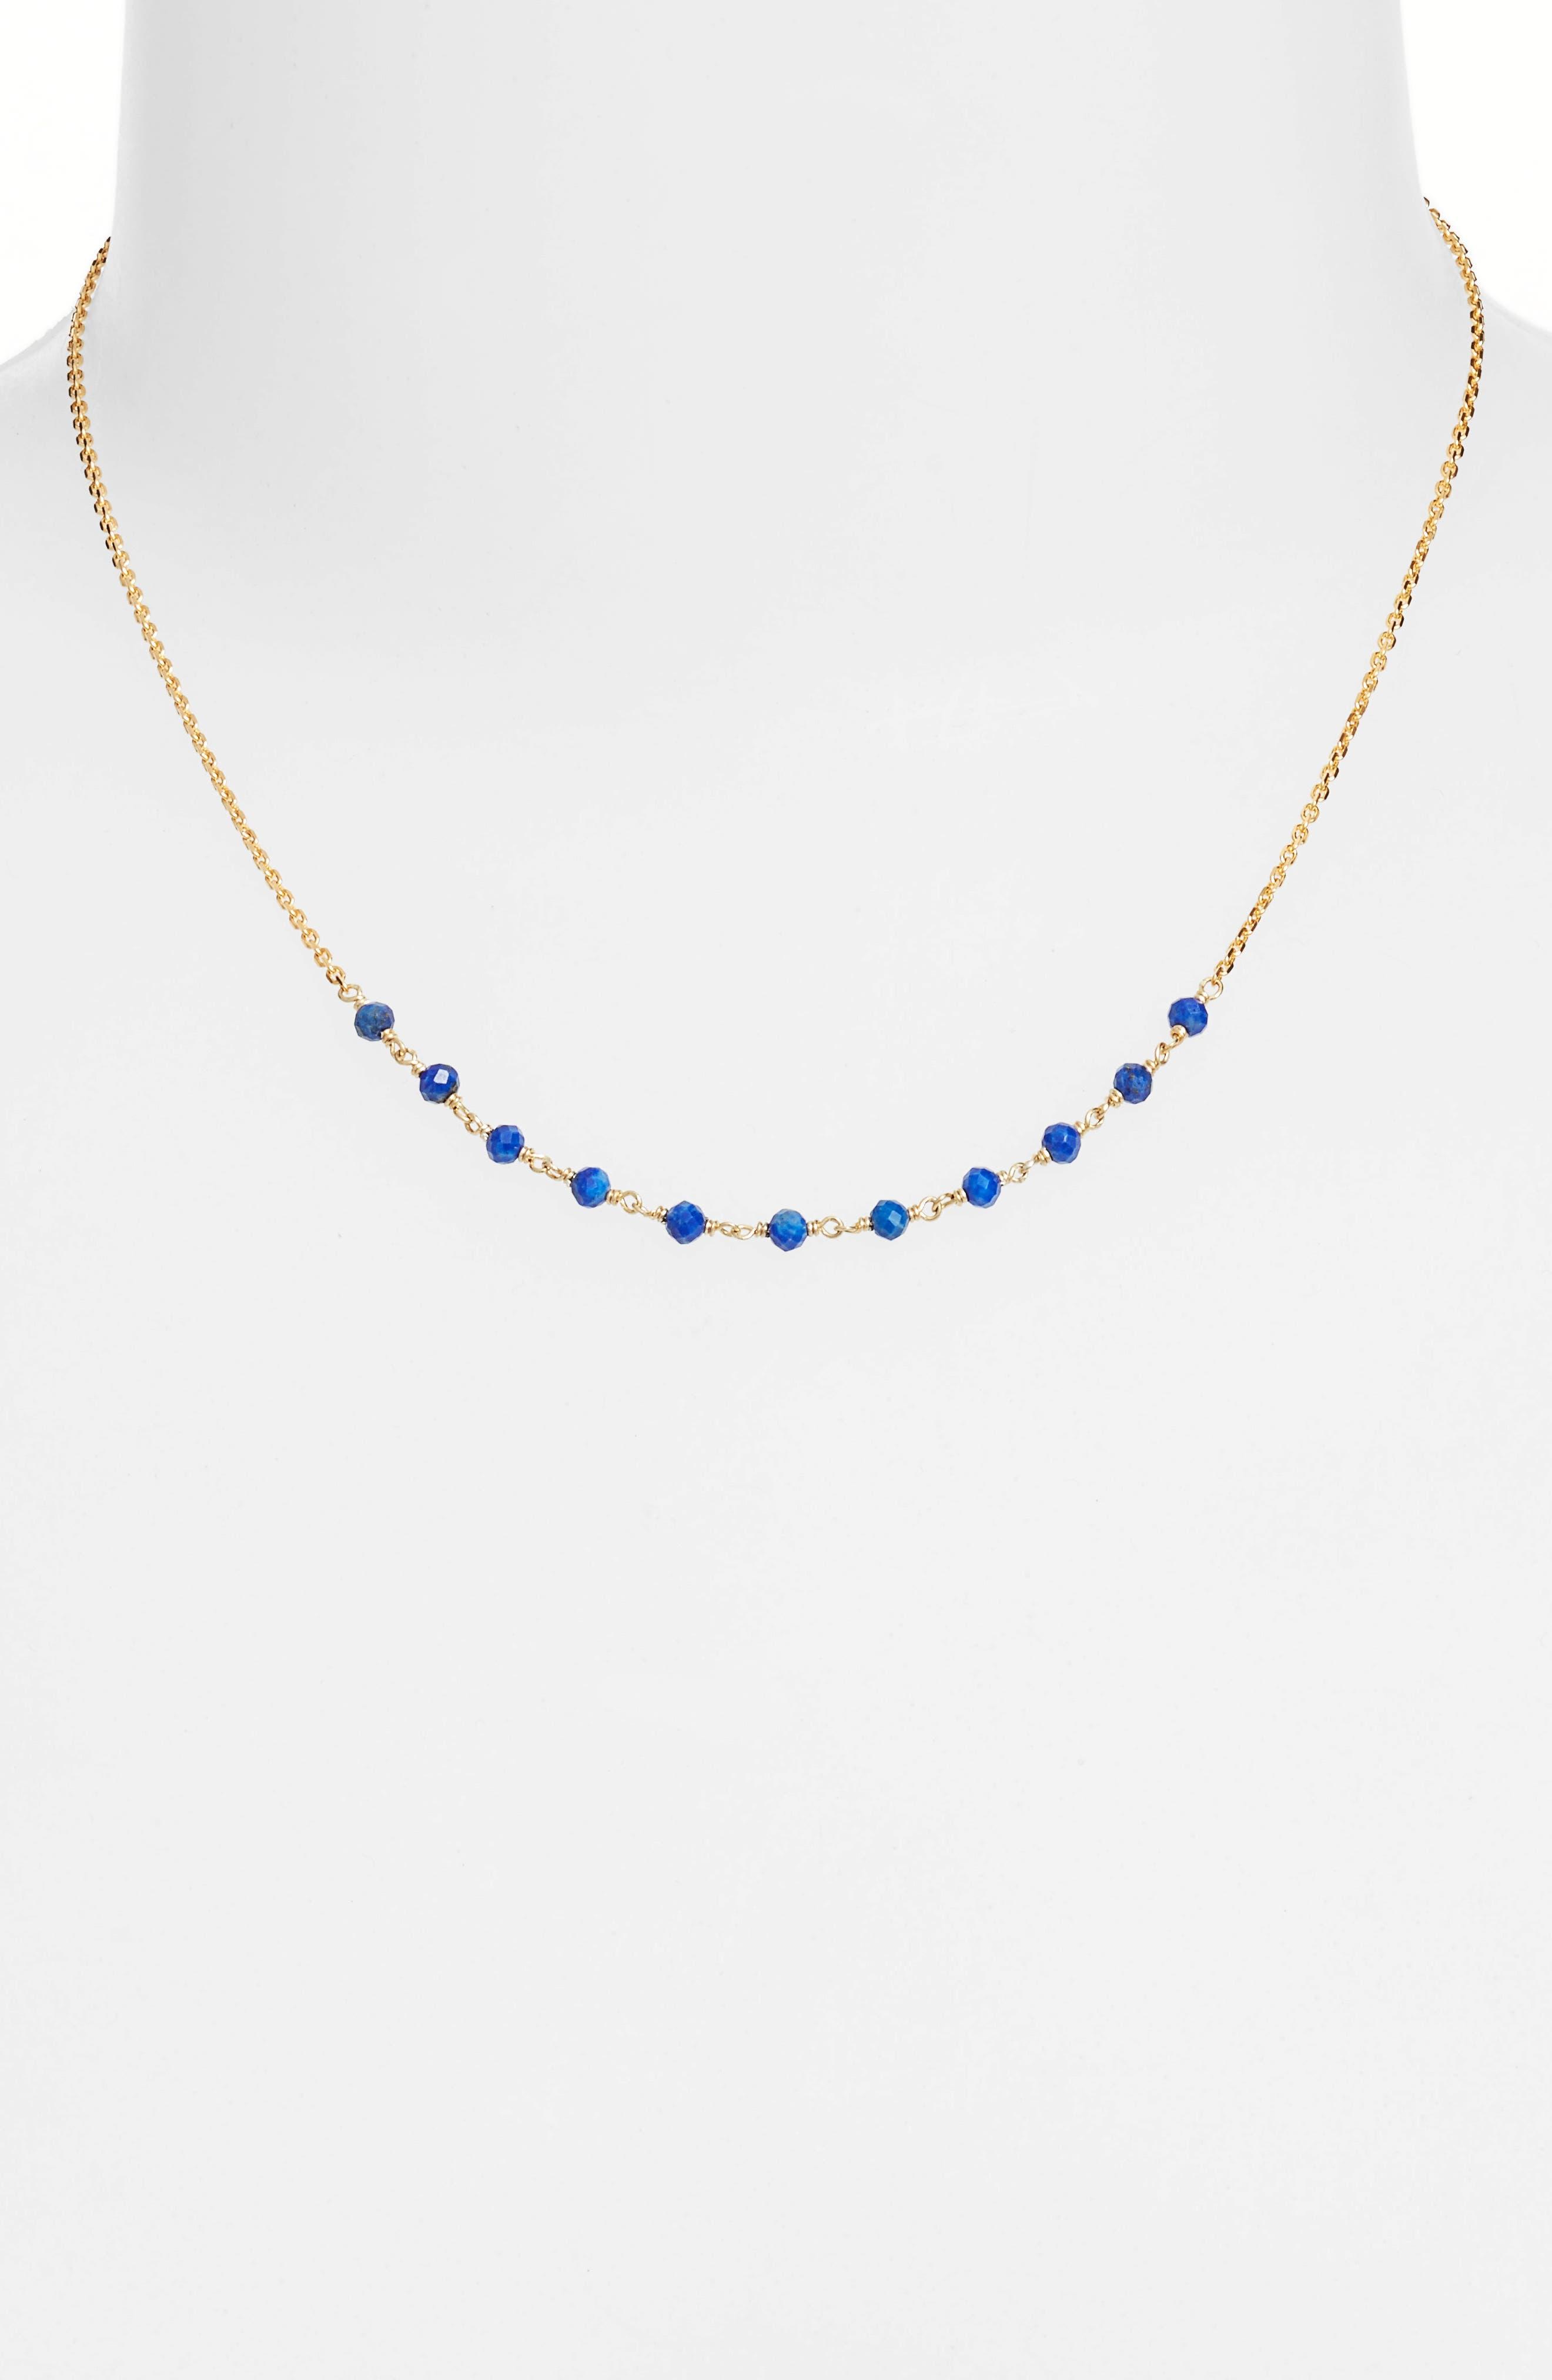 Gold & Bead Necklace,                             Main thumbnail 1, color,                             Gold/ Lapis